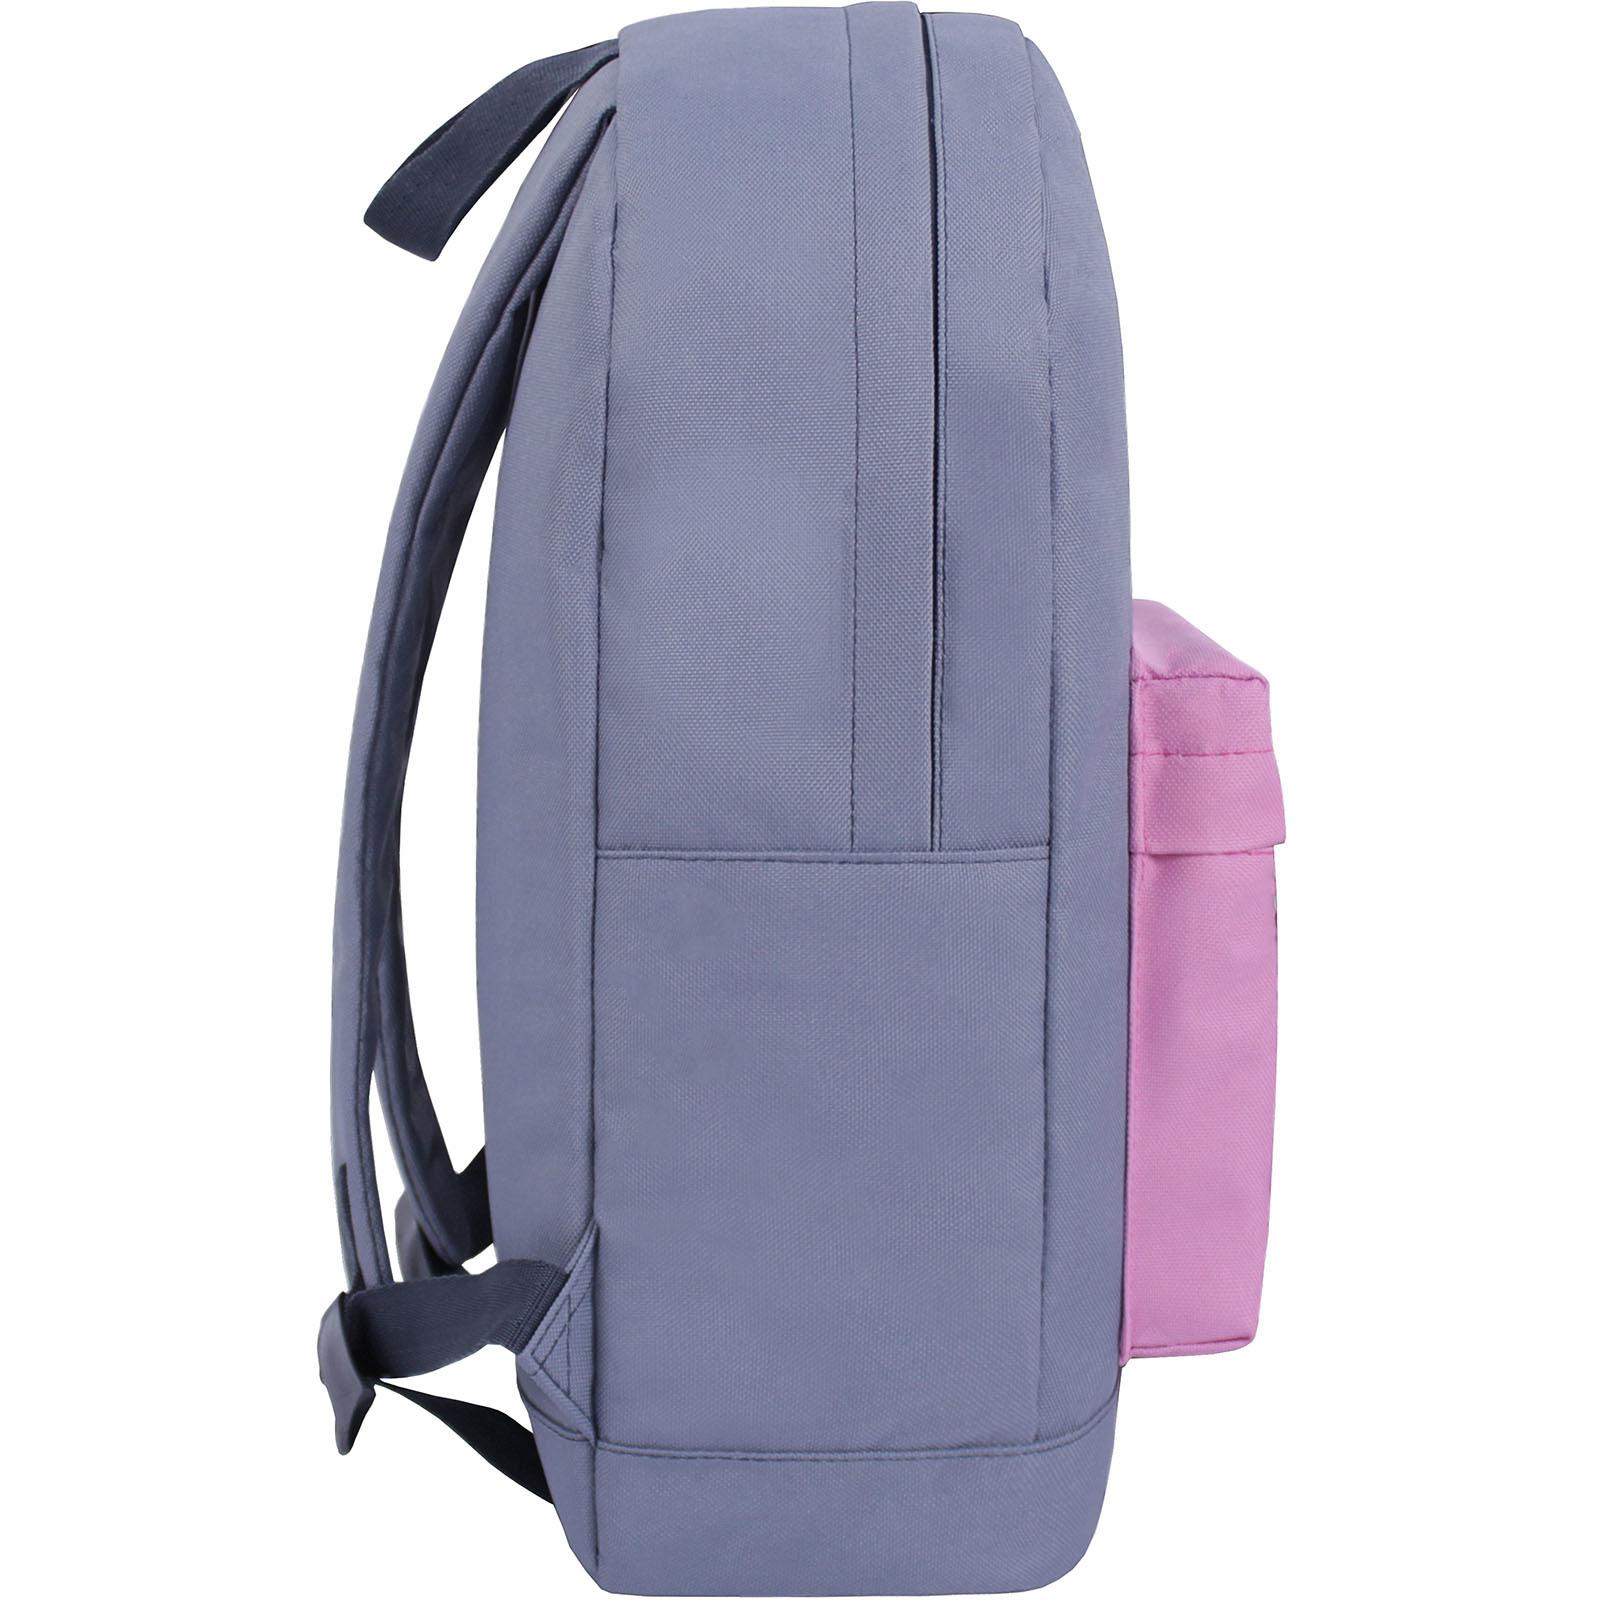 Рюкзак Bagland Молодежный W/R 17 л. серый/розовый (00533662) фото 2